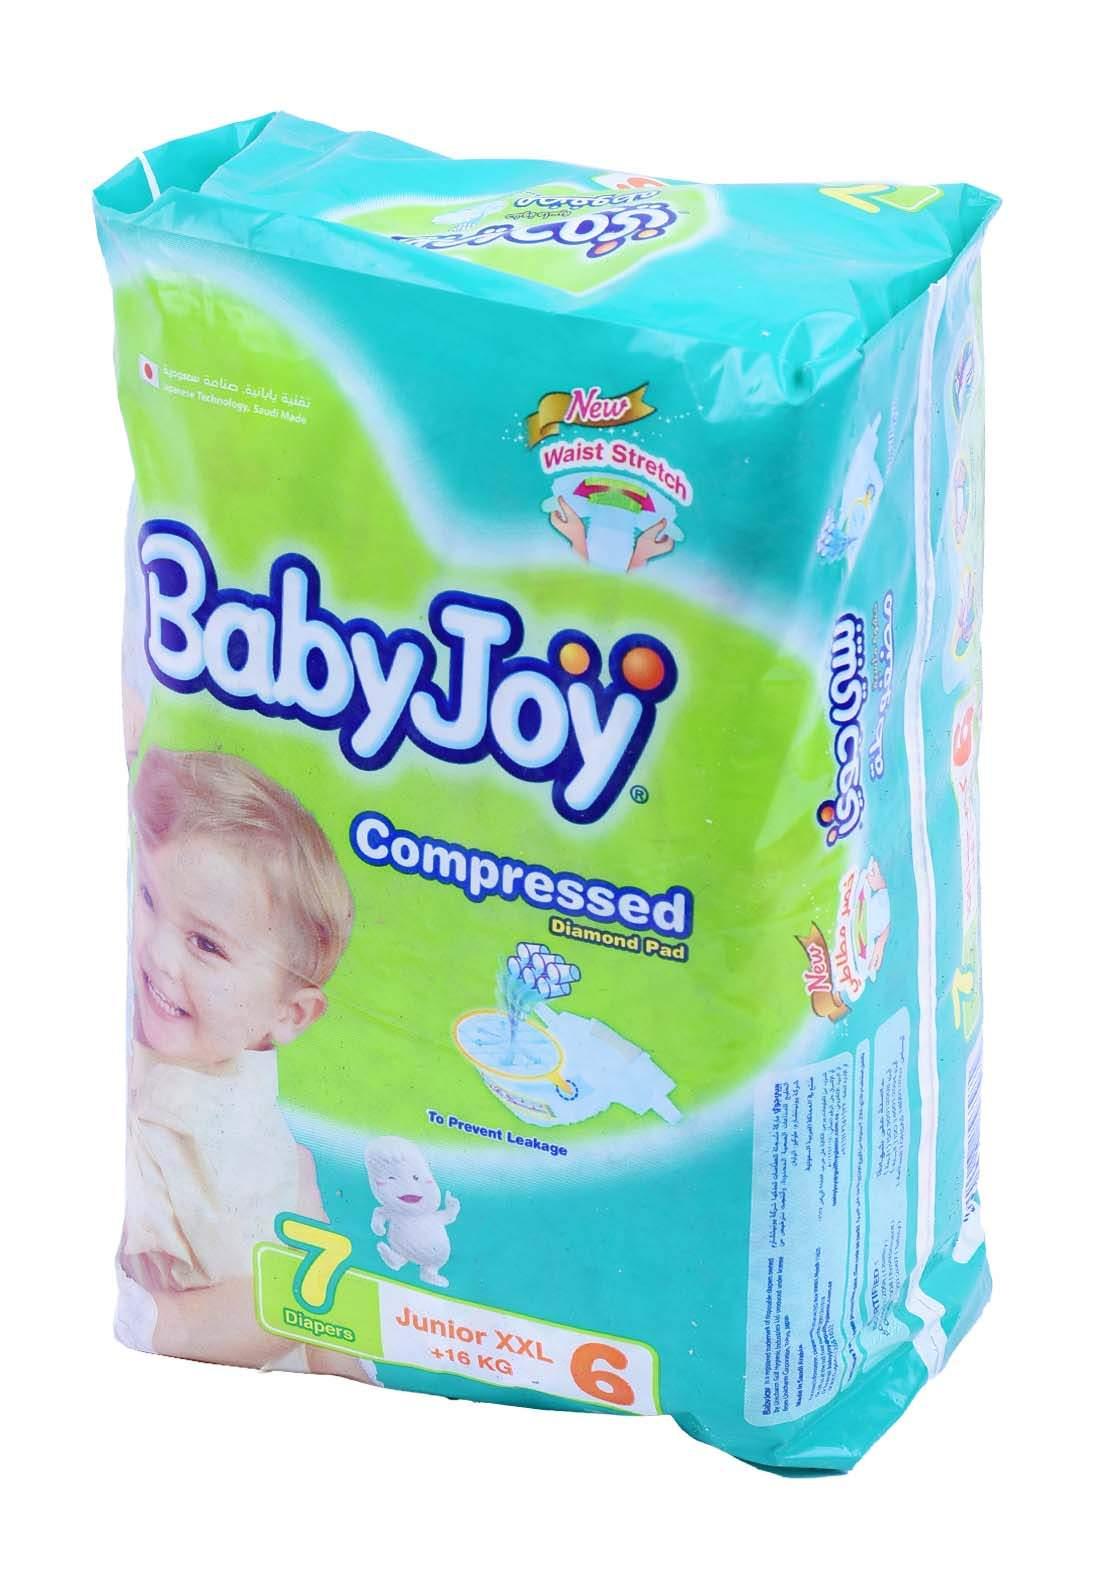 BabyJoy +16  Kg 7 Pcs حفاضات بيبي جوي عادي كبير جدا رقم 6